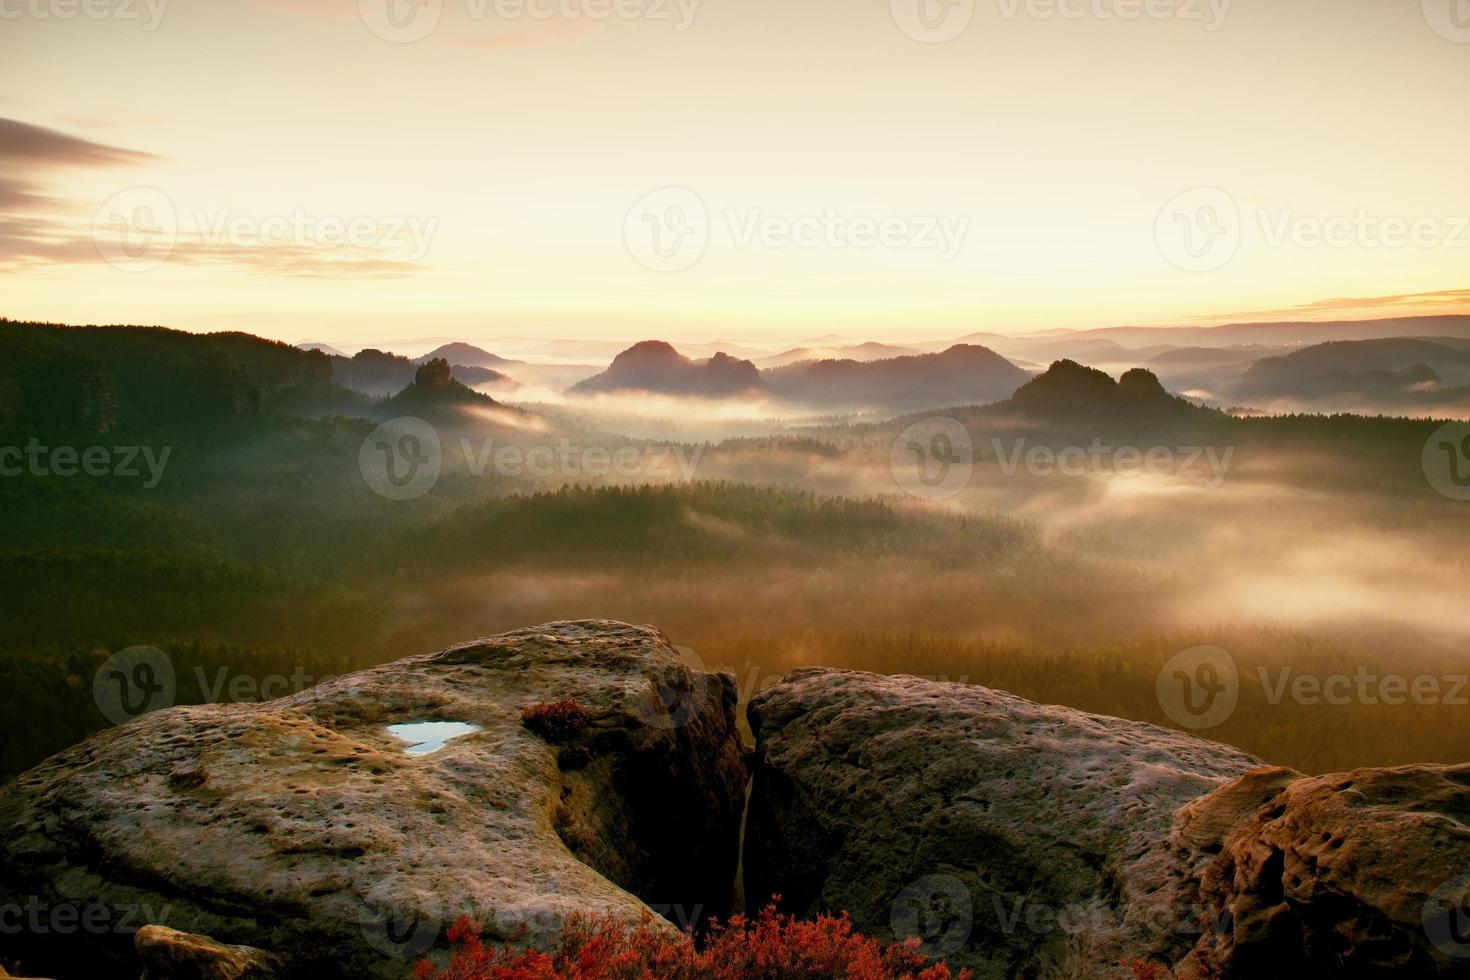 kleiner winterbergblick. fantastischer verträumter Sonnenaufgang in felsigen Bergen foto